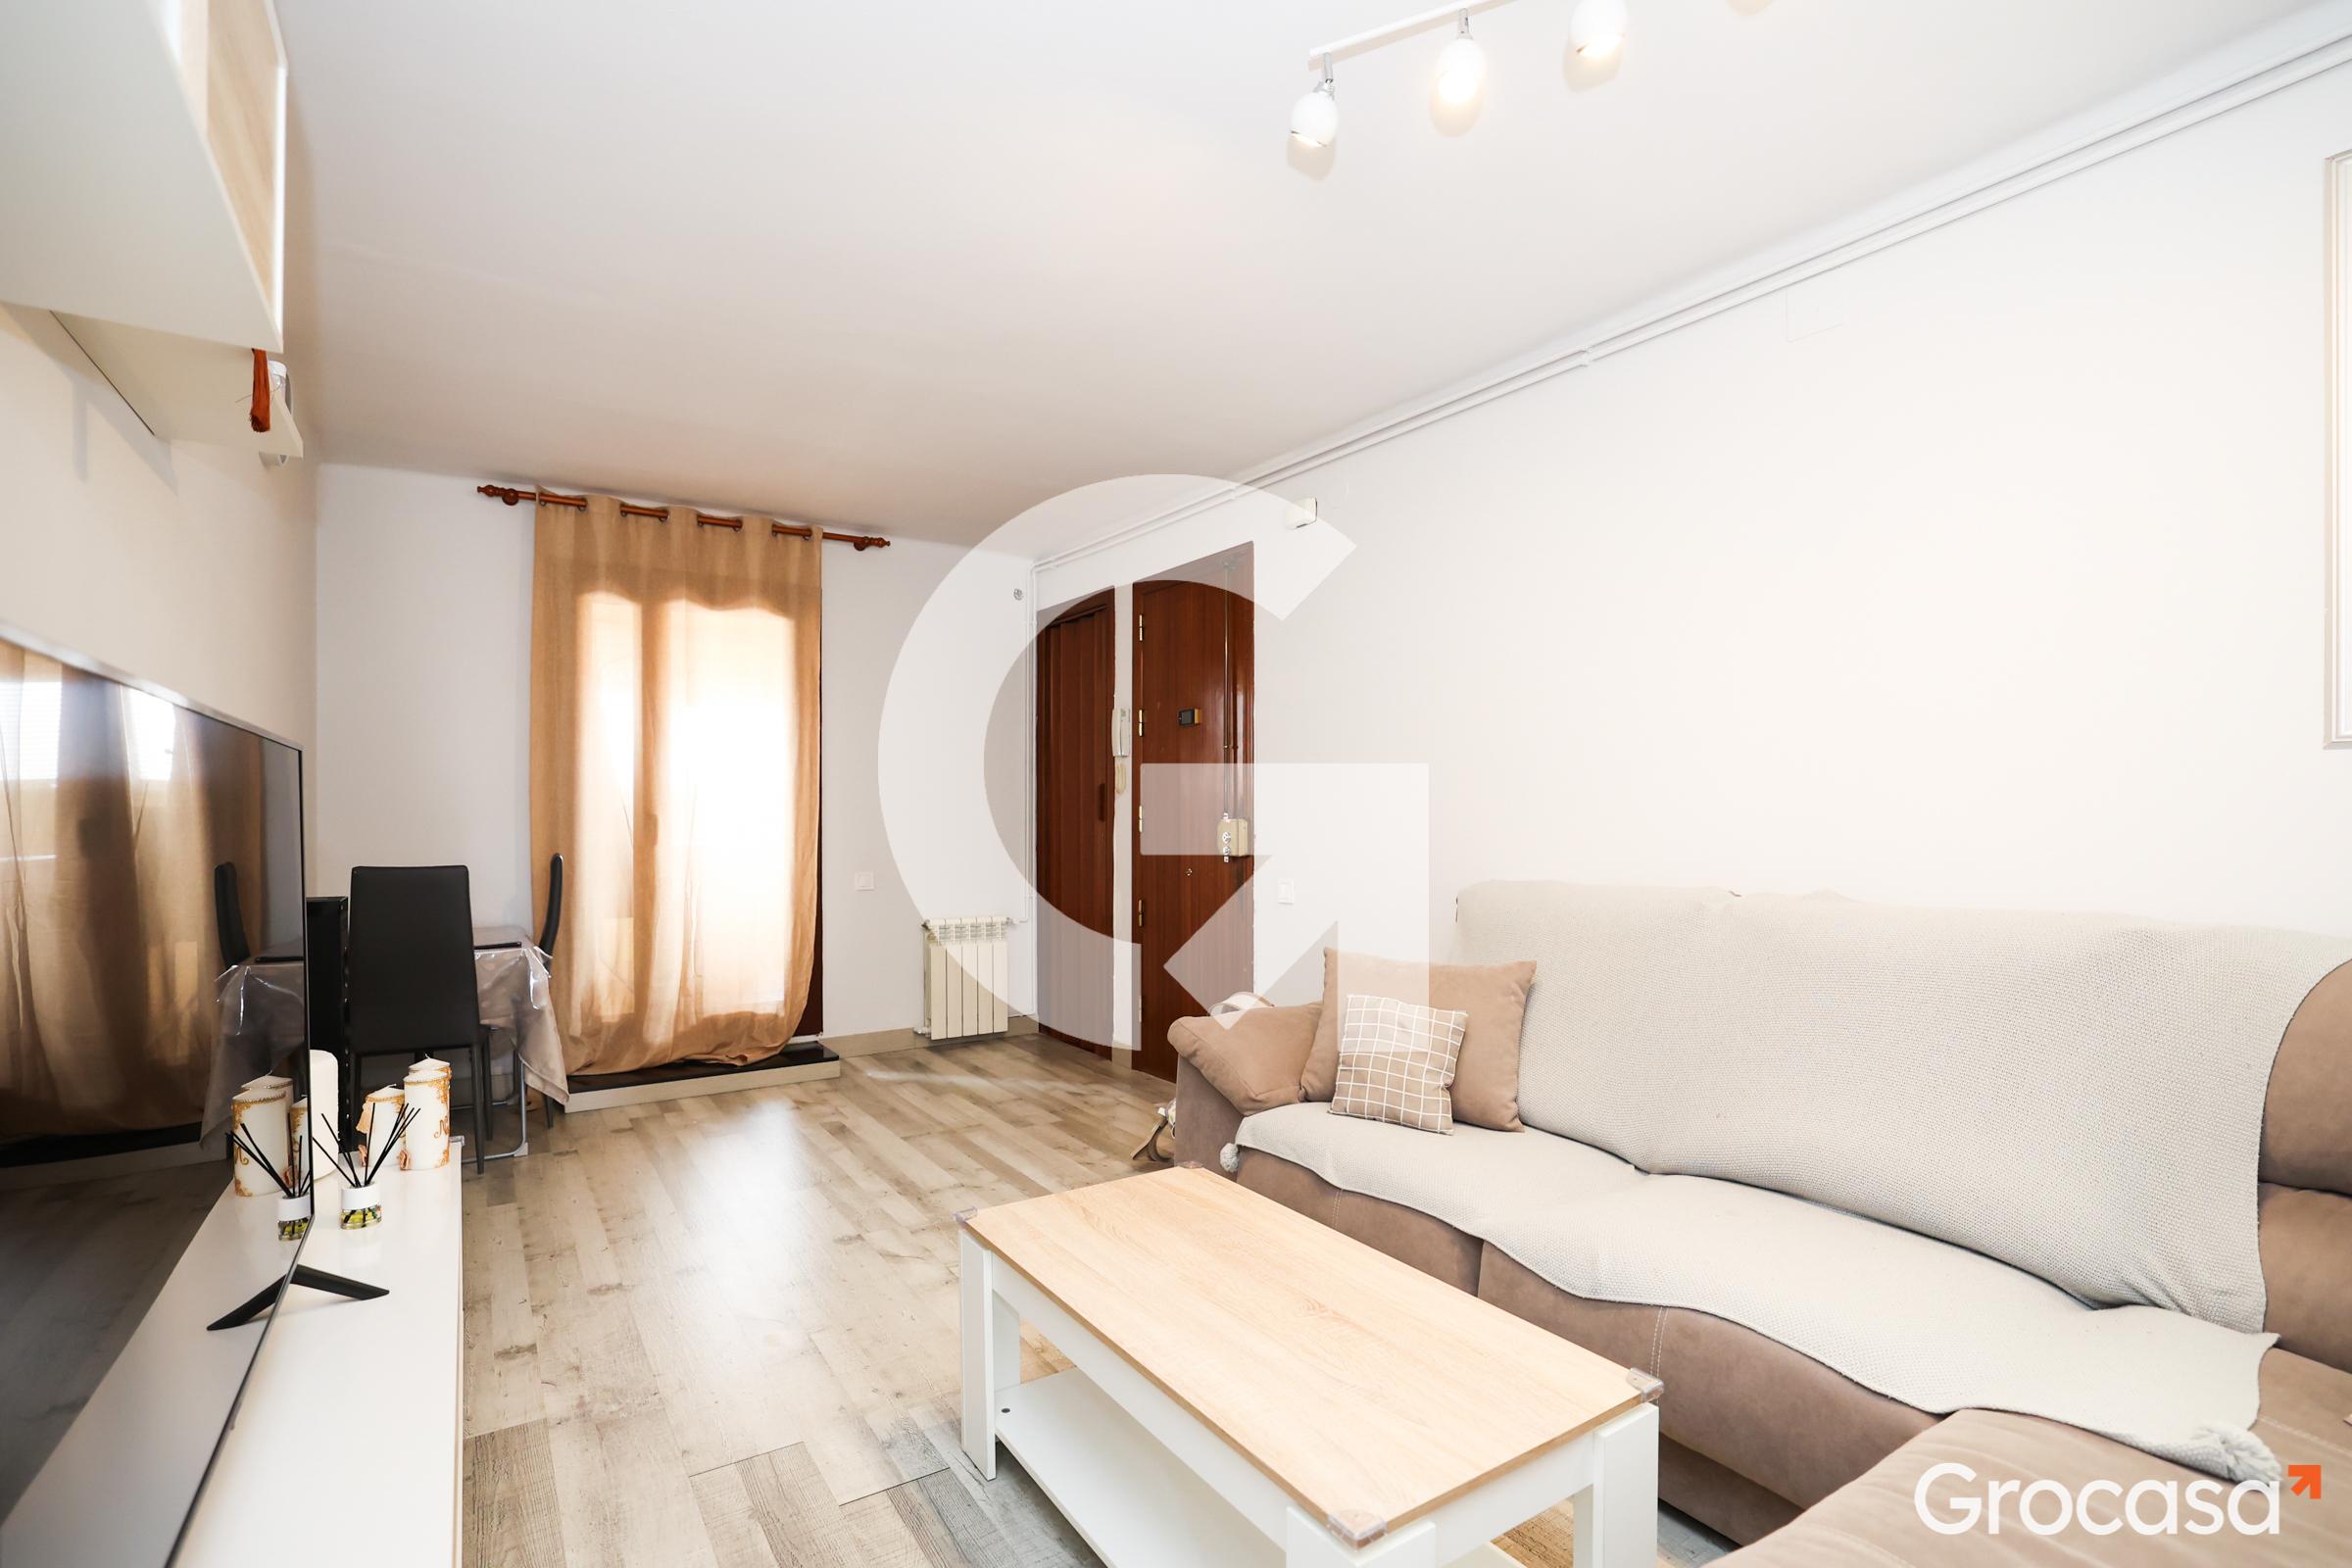 Ático en Vinyets moli vell en Sant Boi de Llobregat en Venta por 134.000€